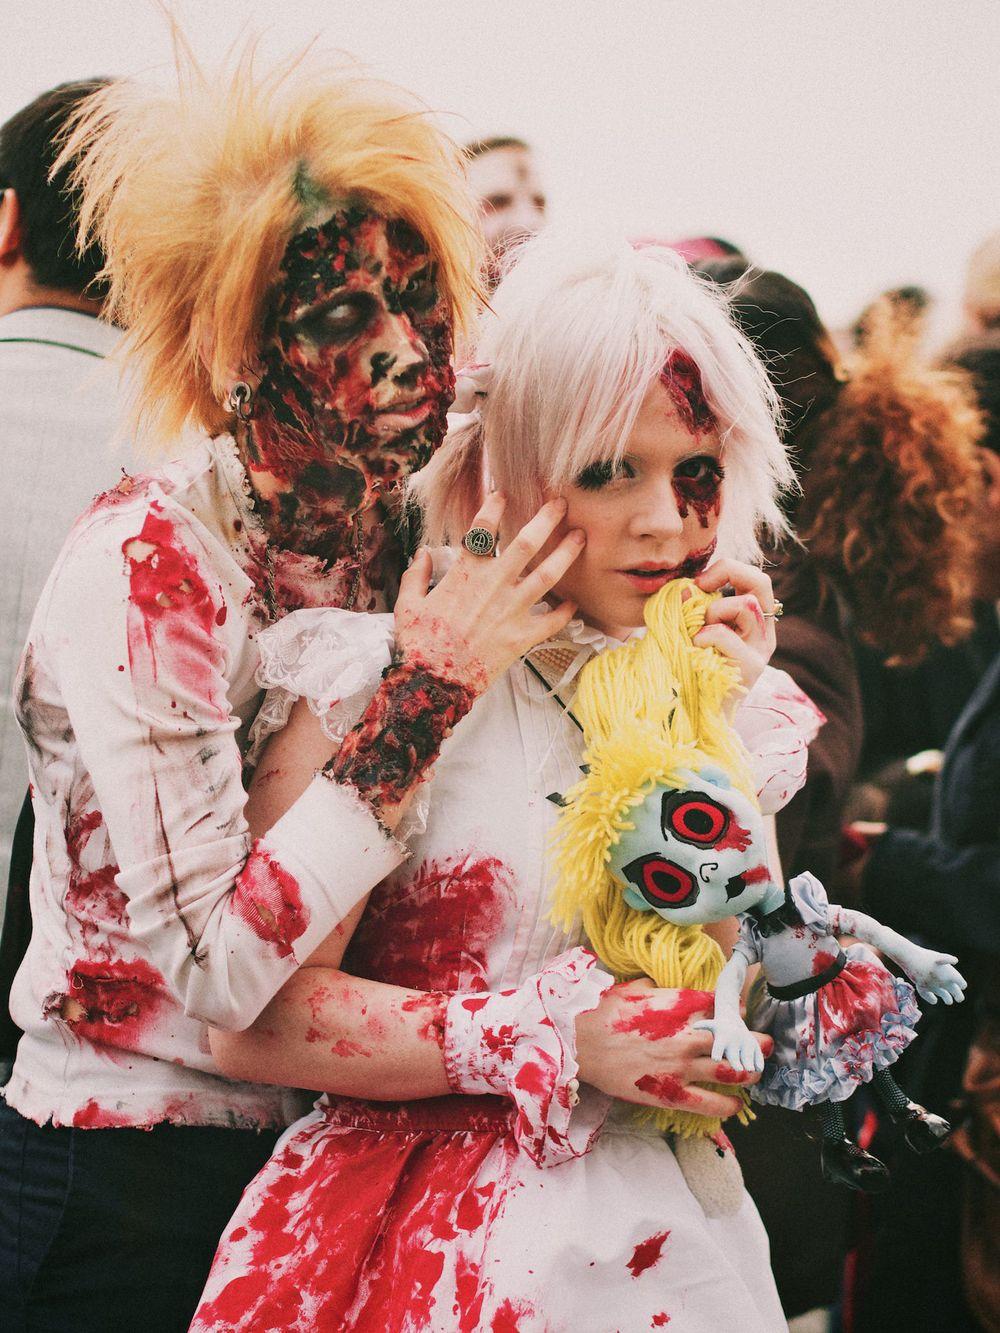 Zombie 008.jpg